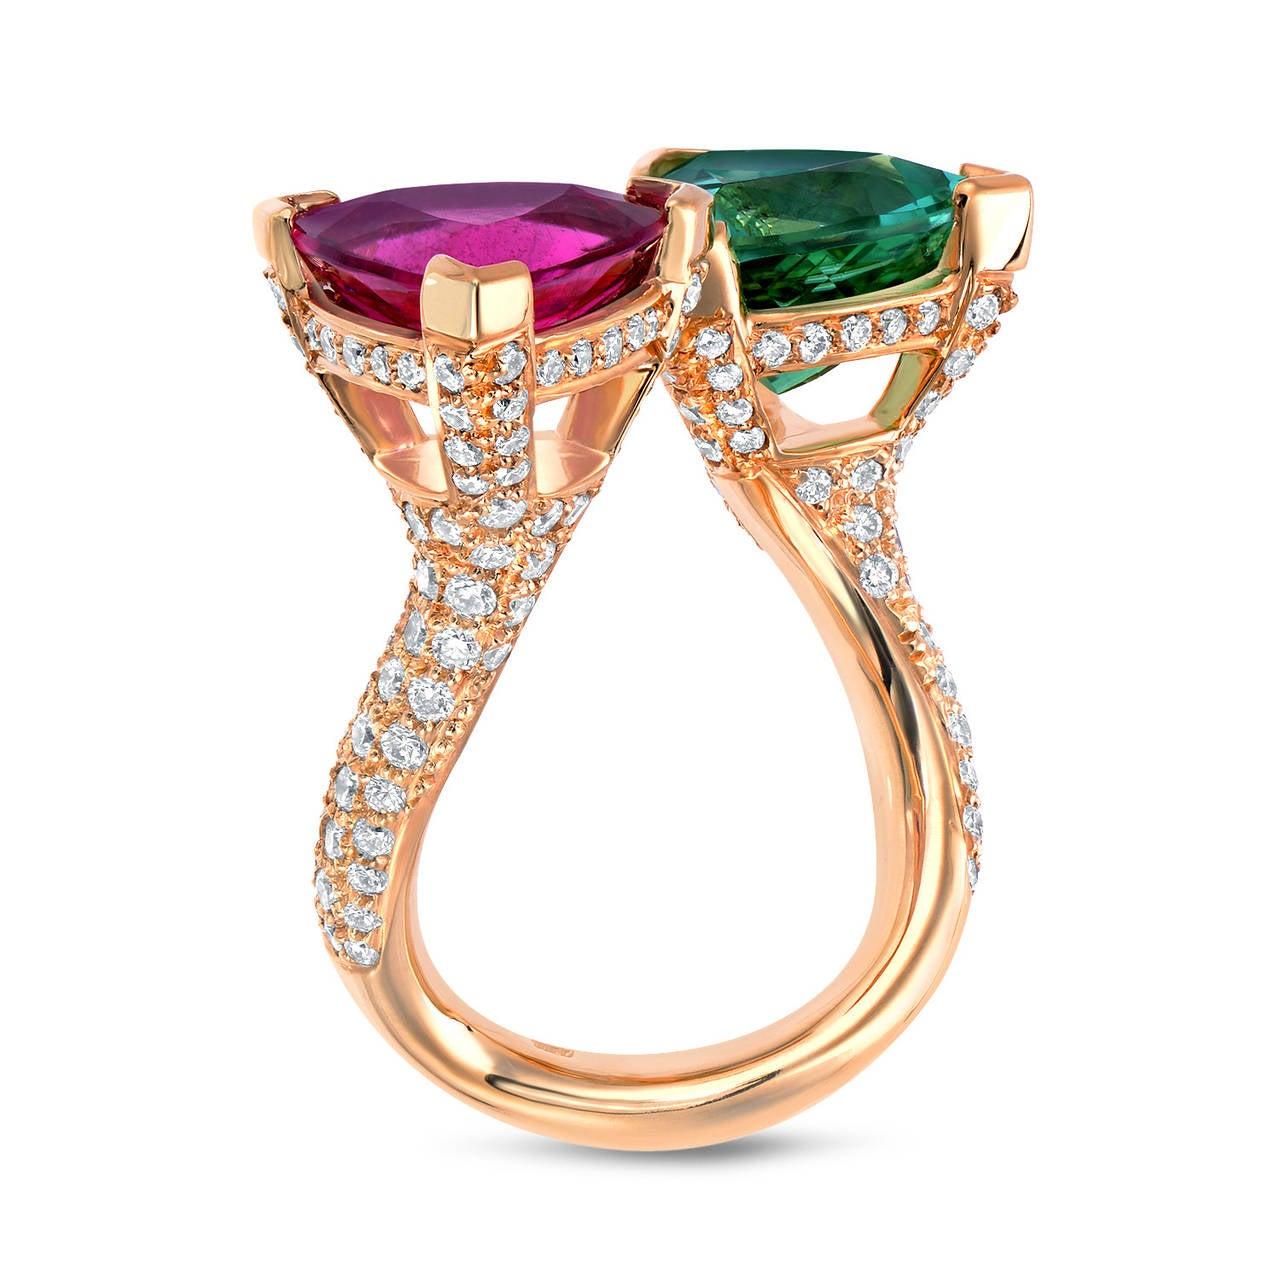 Mint Green Tourmaline Pink Tourmaline Ring For Sale At 1stdibs